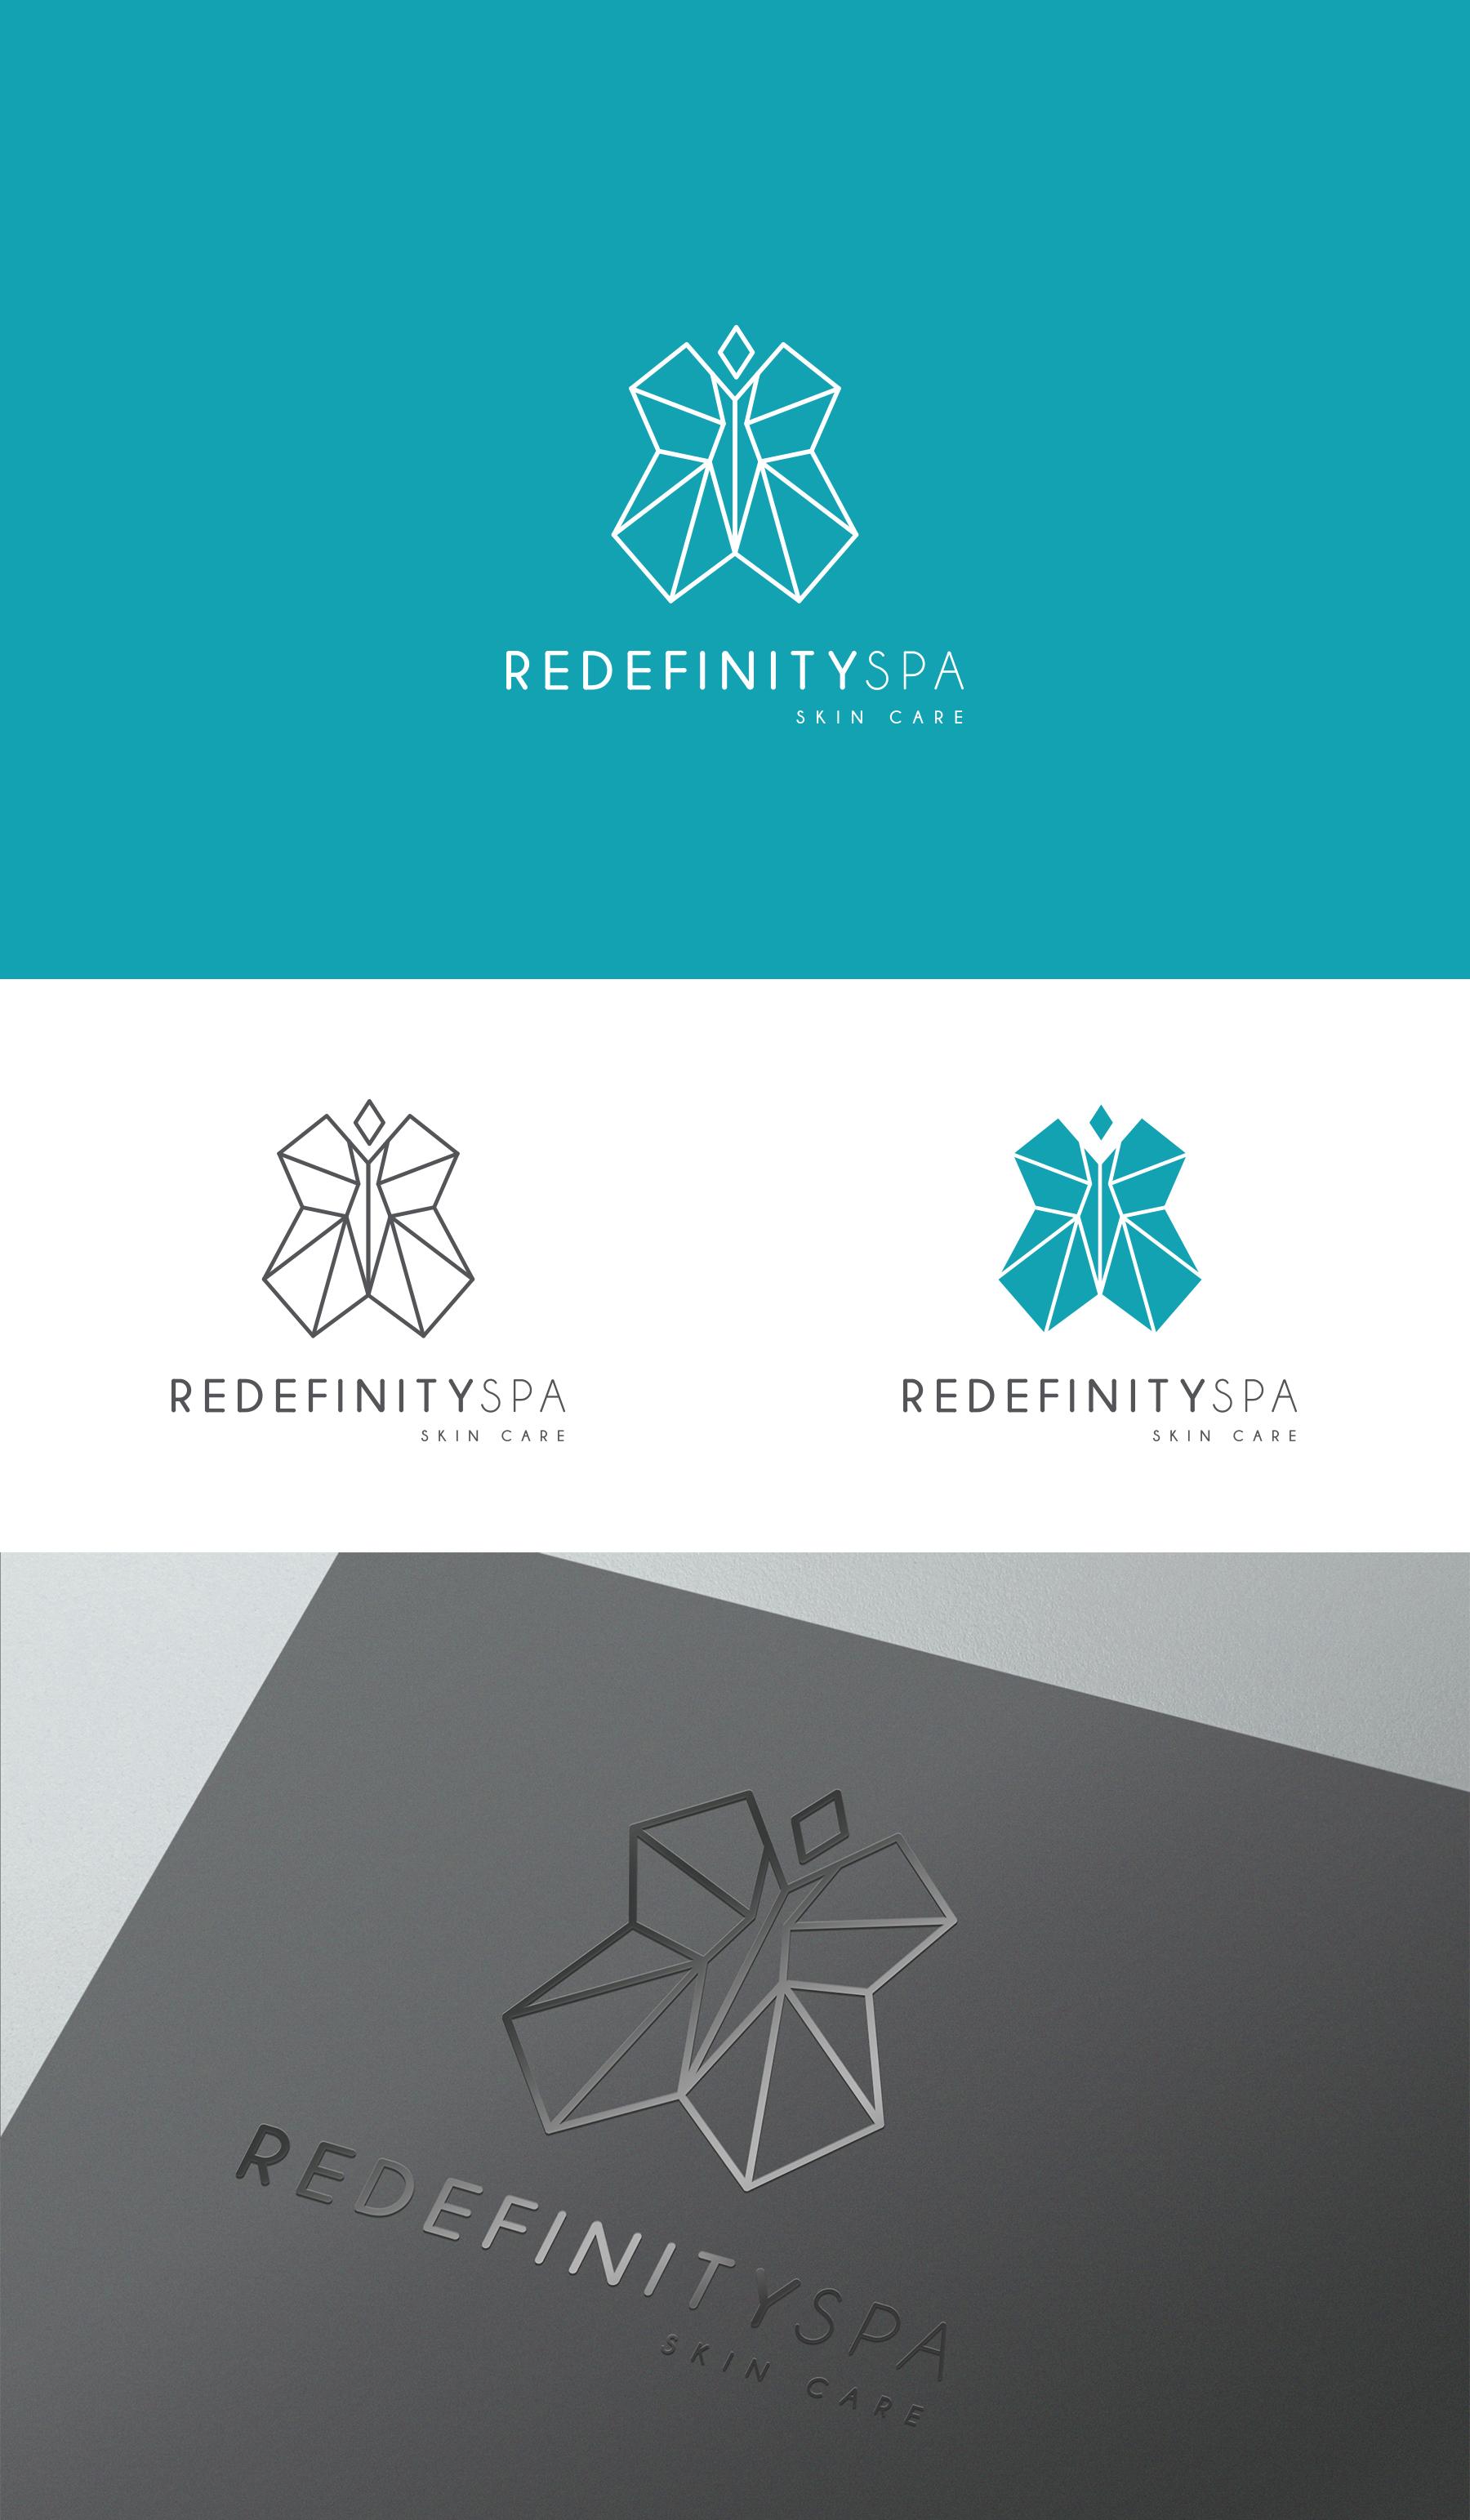 montaje_final_redefinityspa